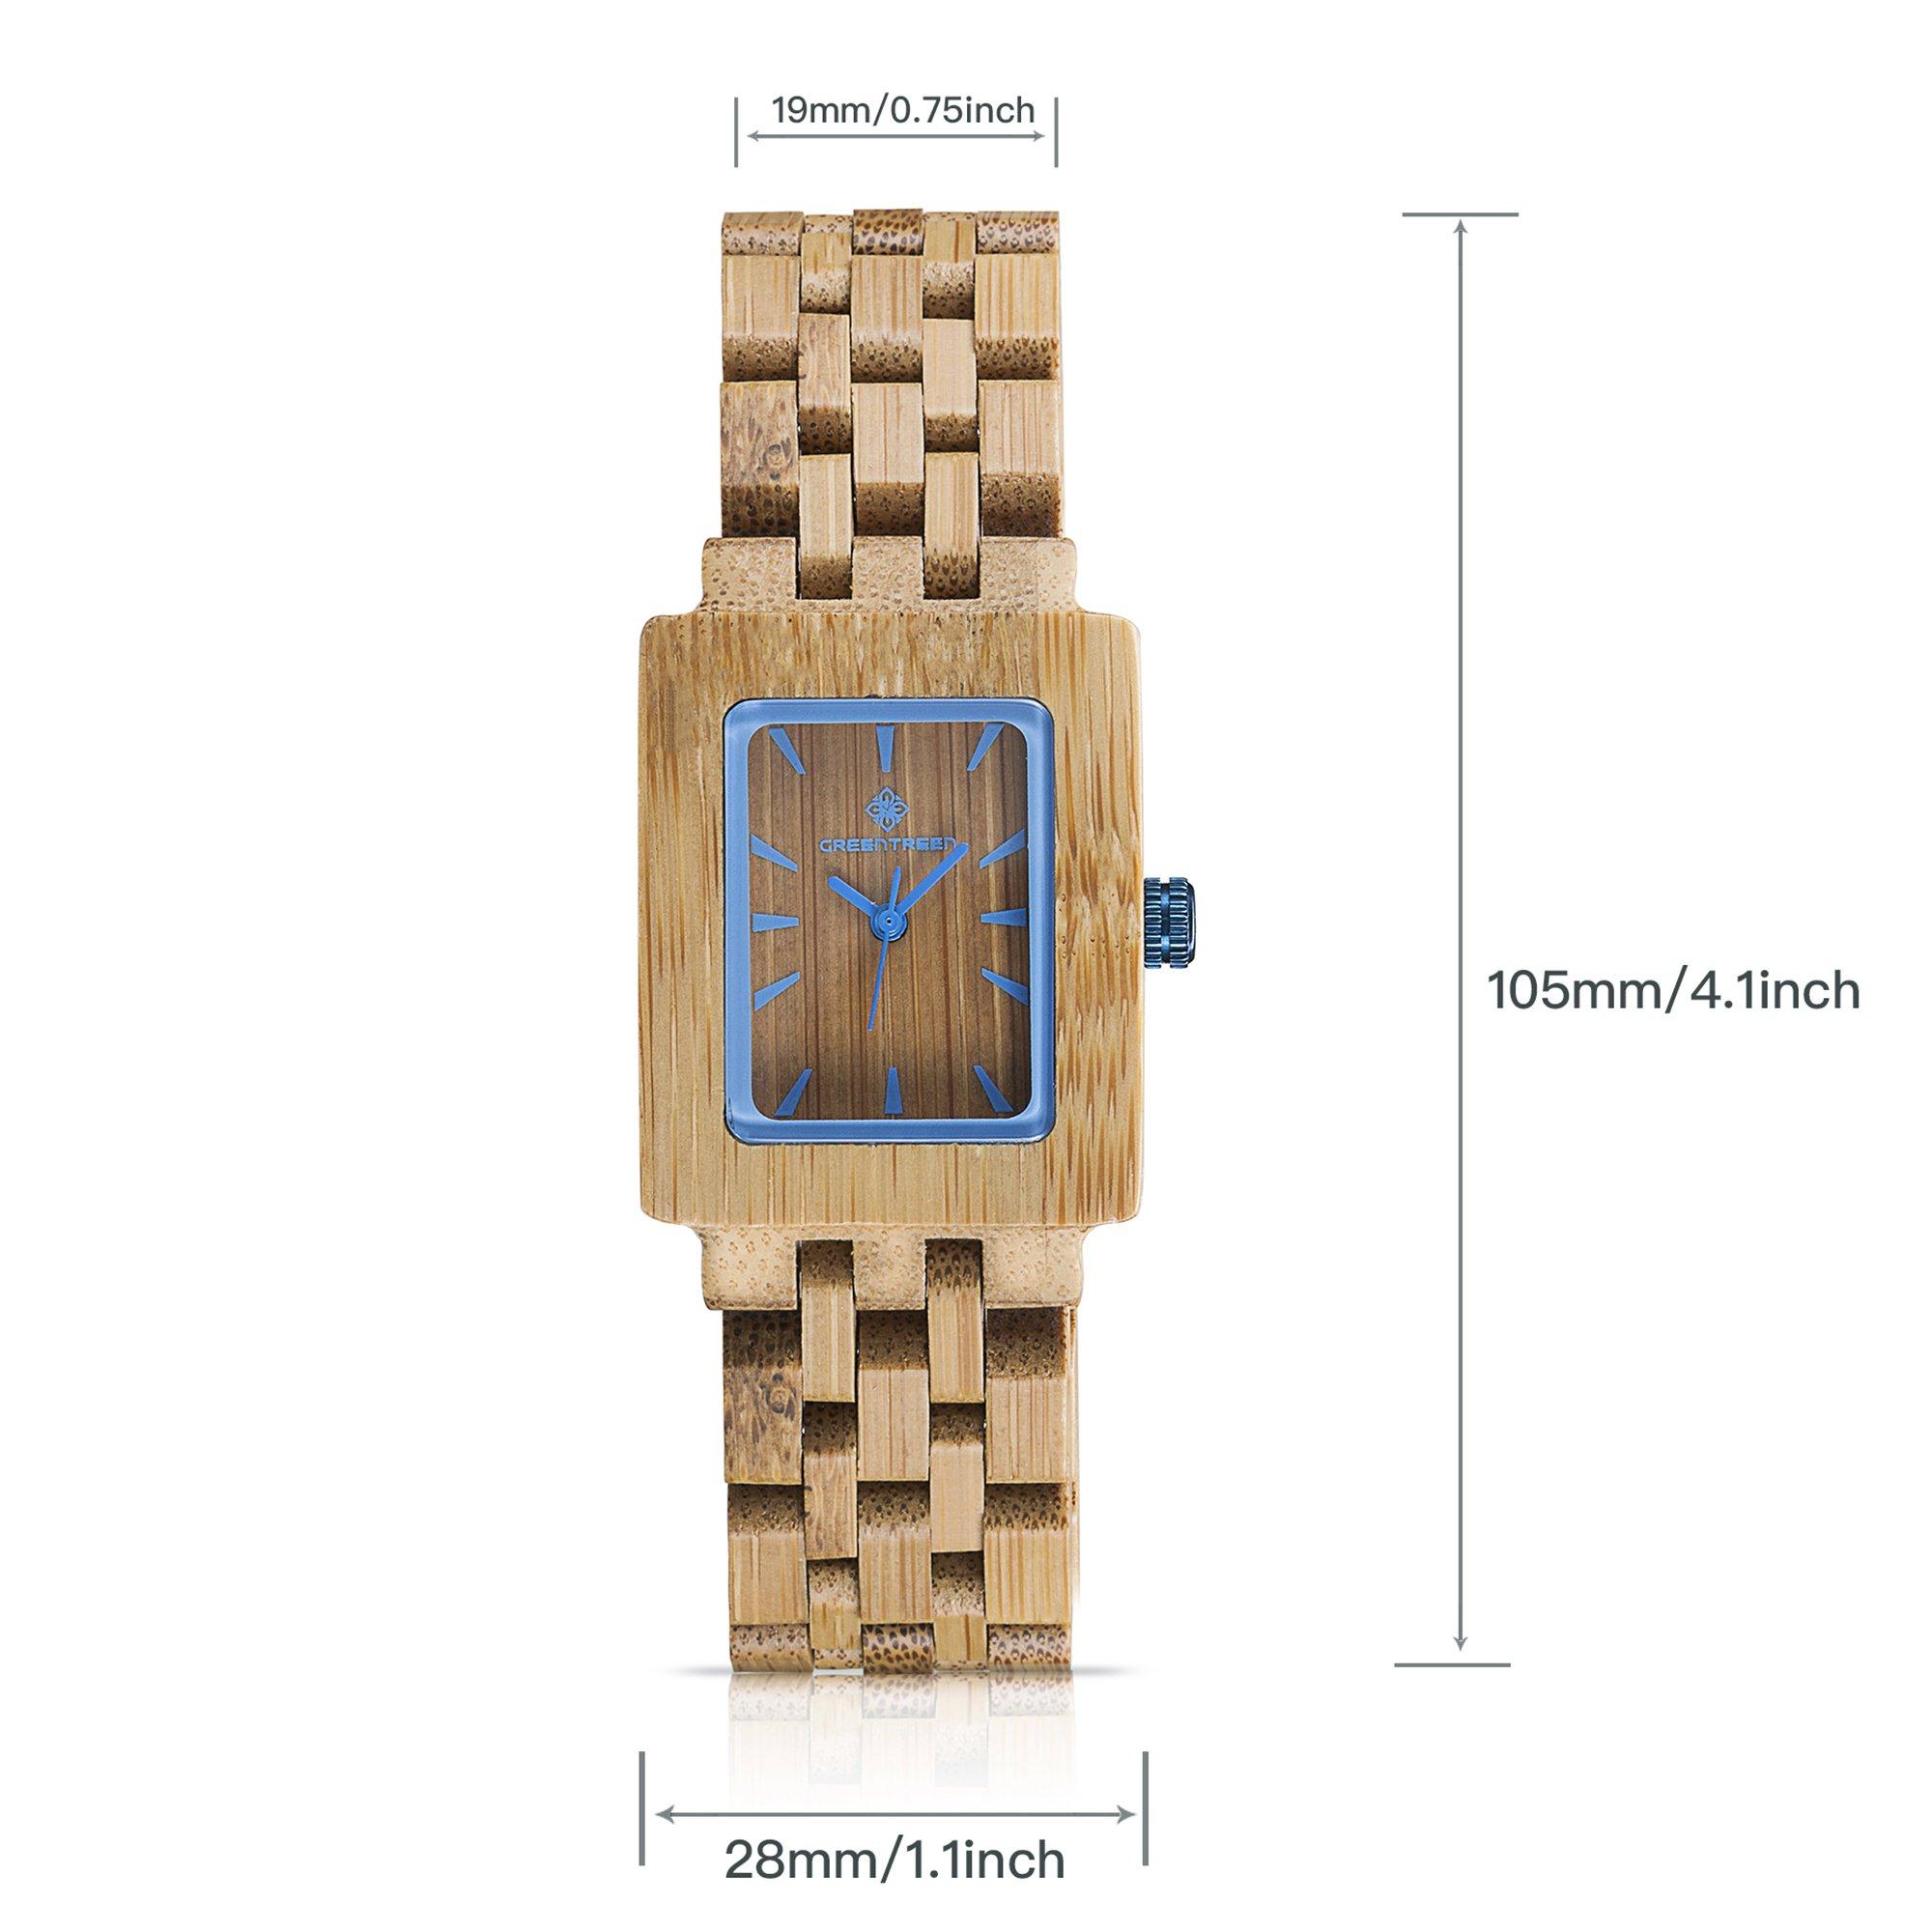 Amexi Bambus Damenuhr Kirschholz Uhren Braun